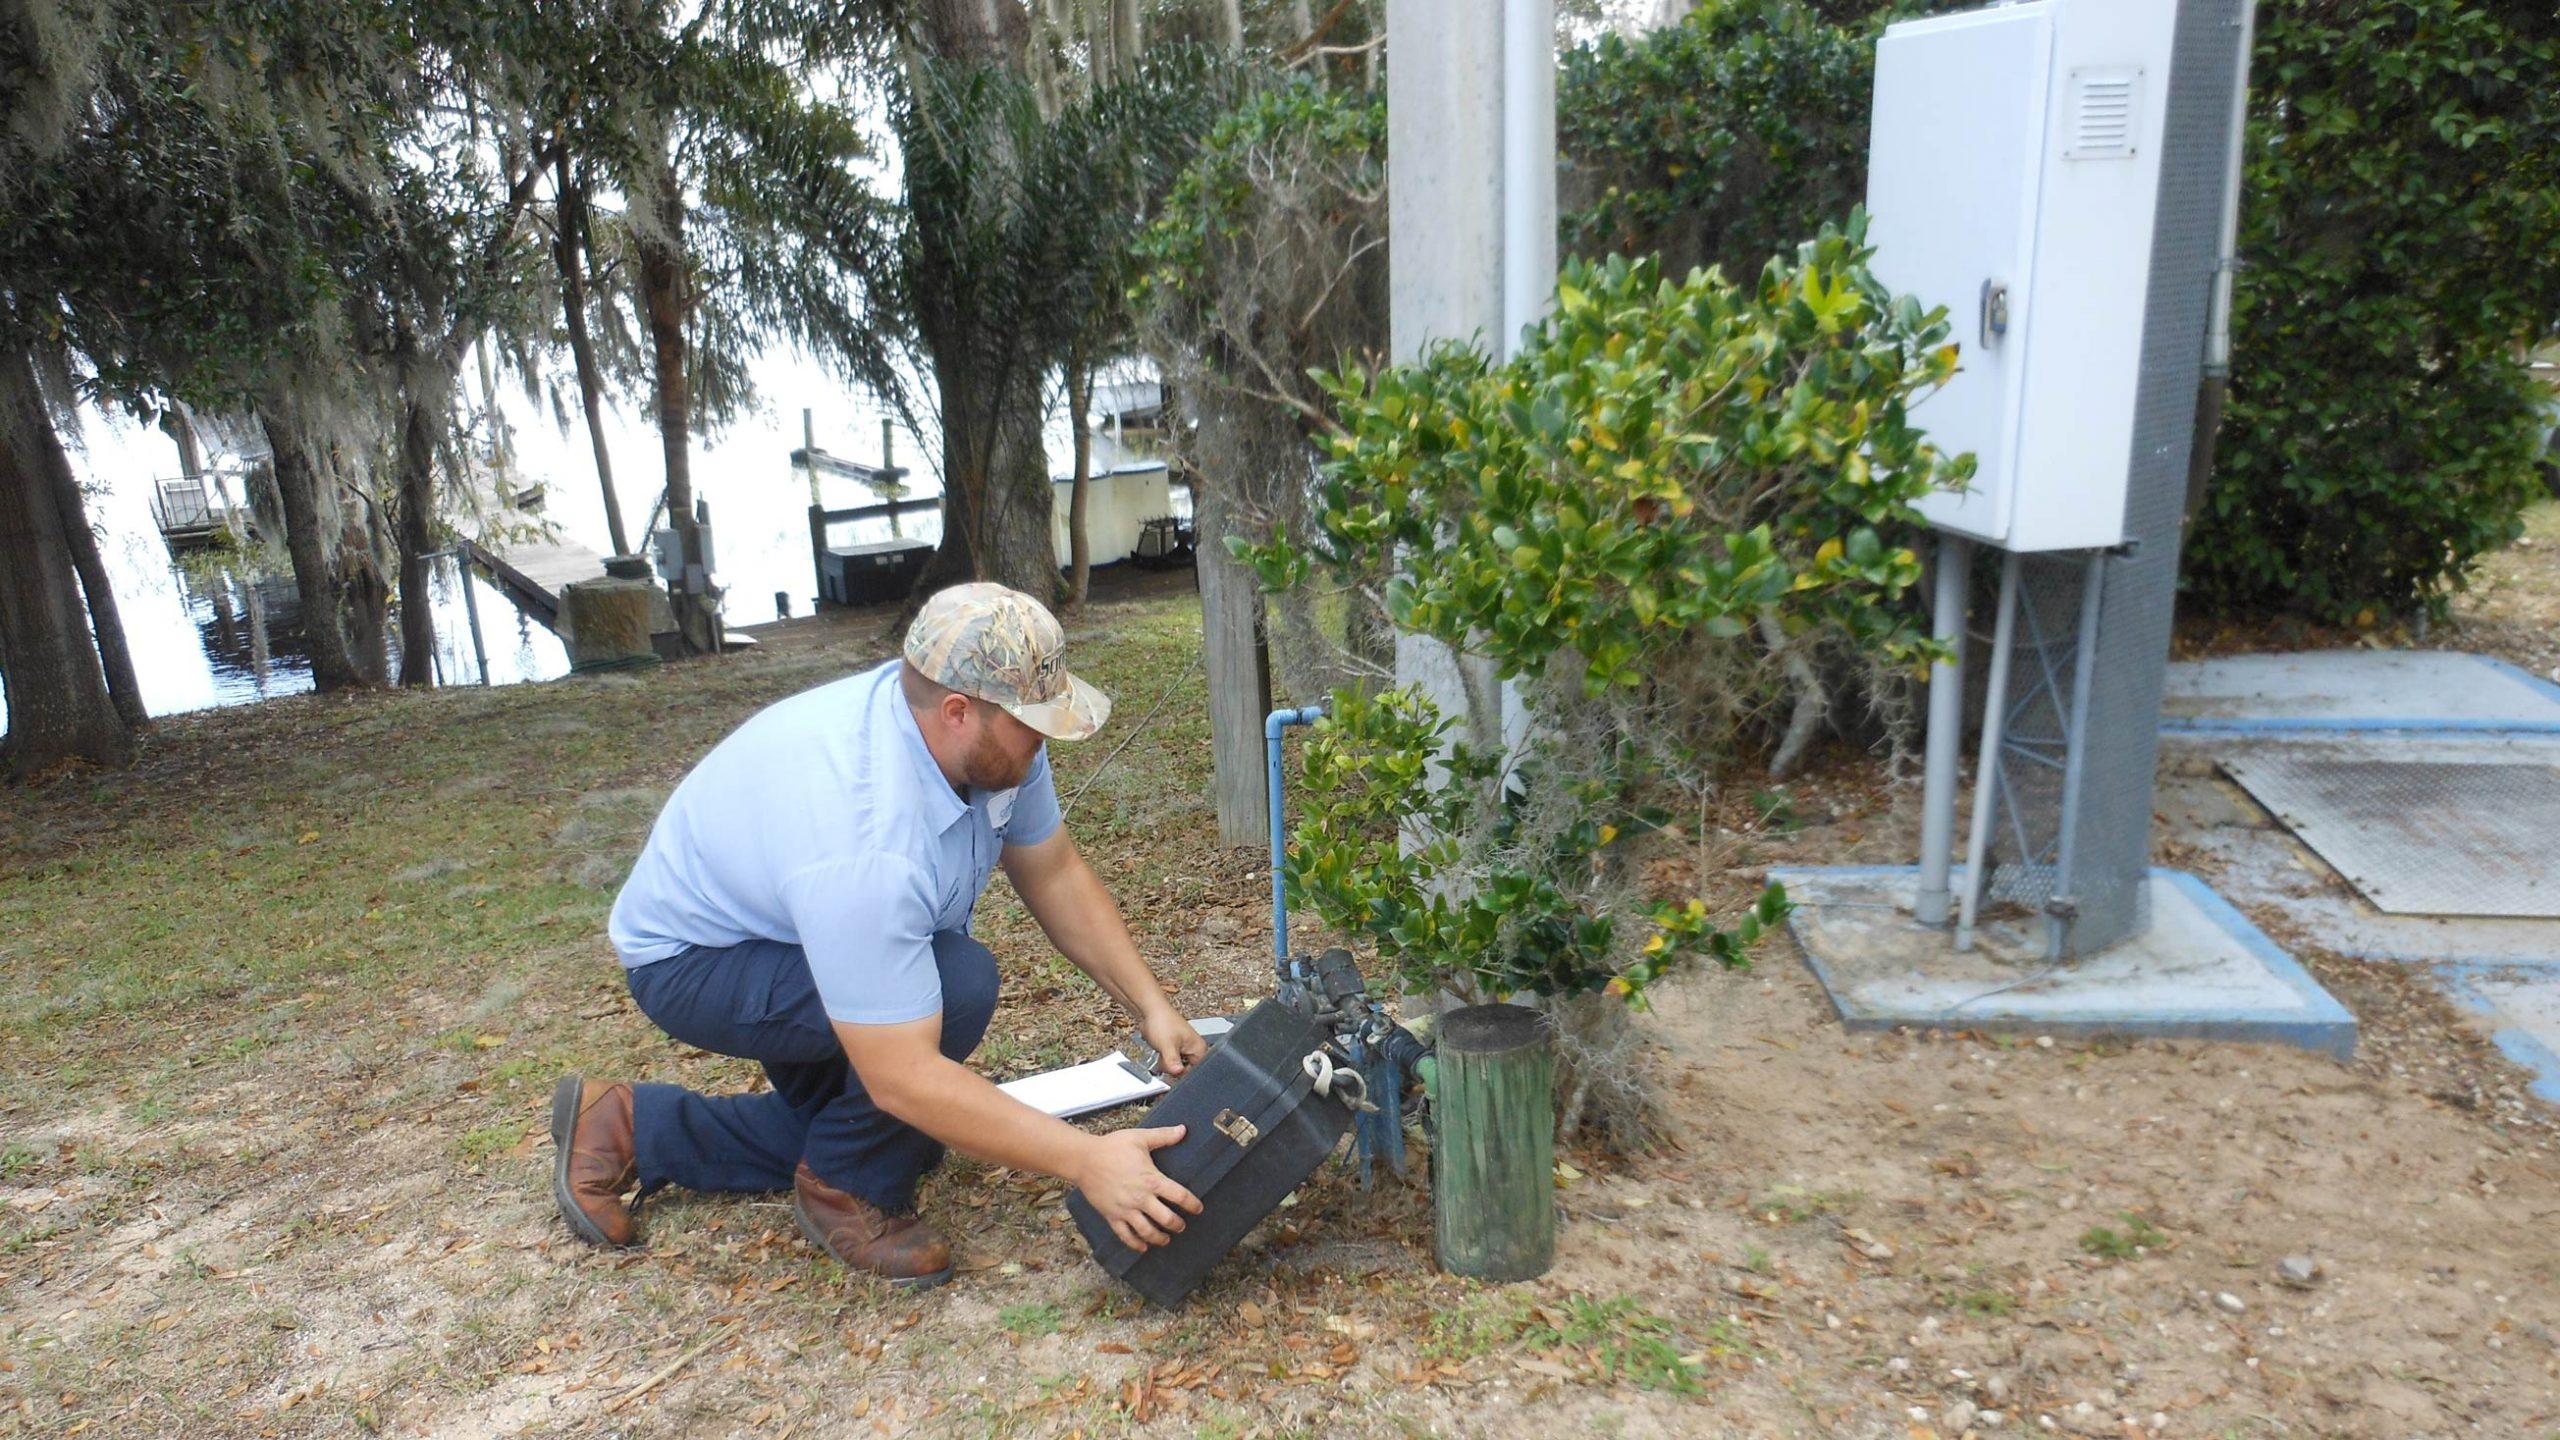 A Clermont Utilities worker repairs a homeowner's water meter.